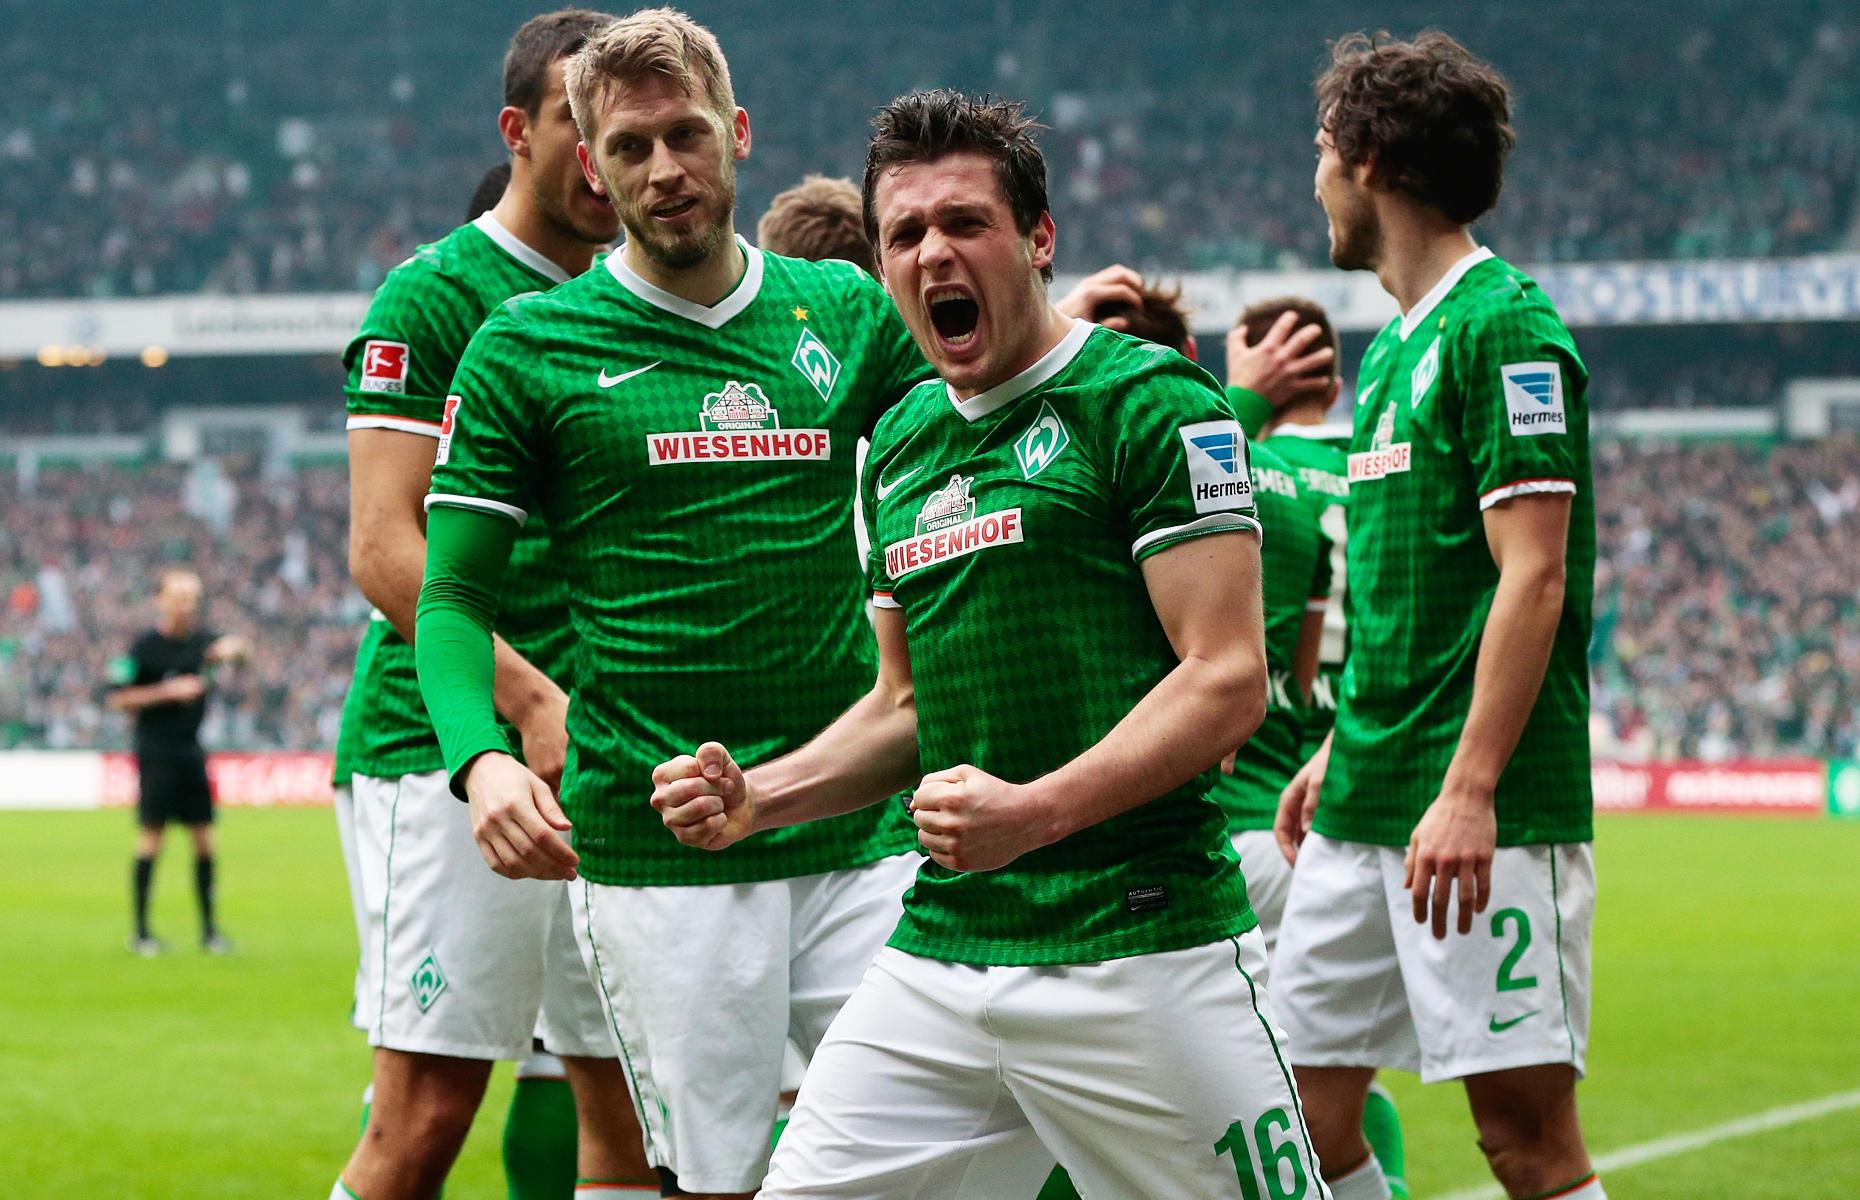 Image result for Werder Bremen